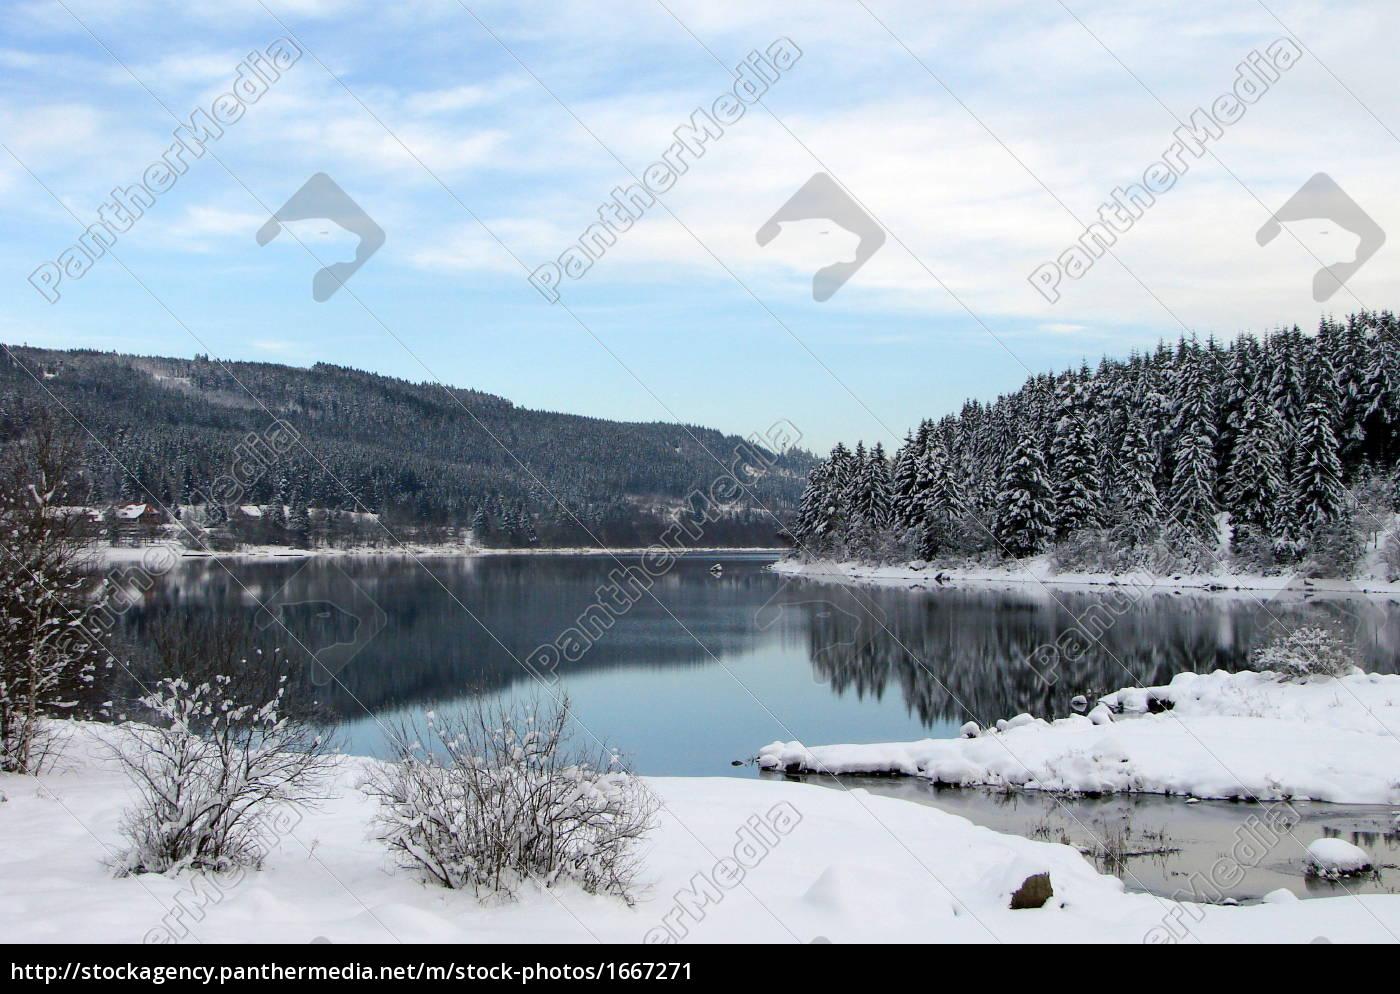 winter, world - 1667271